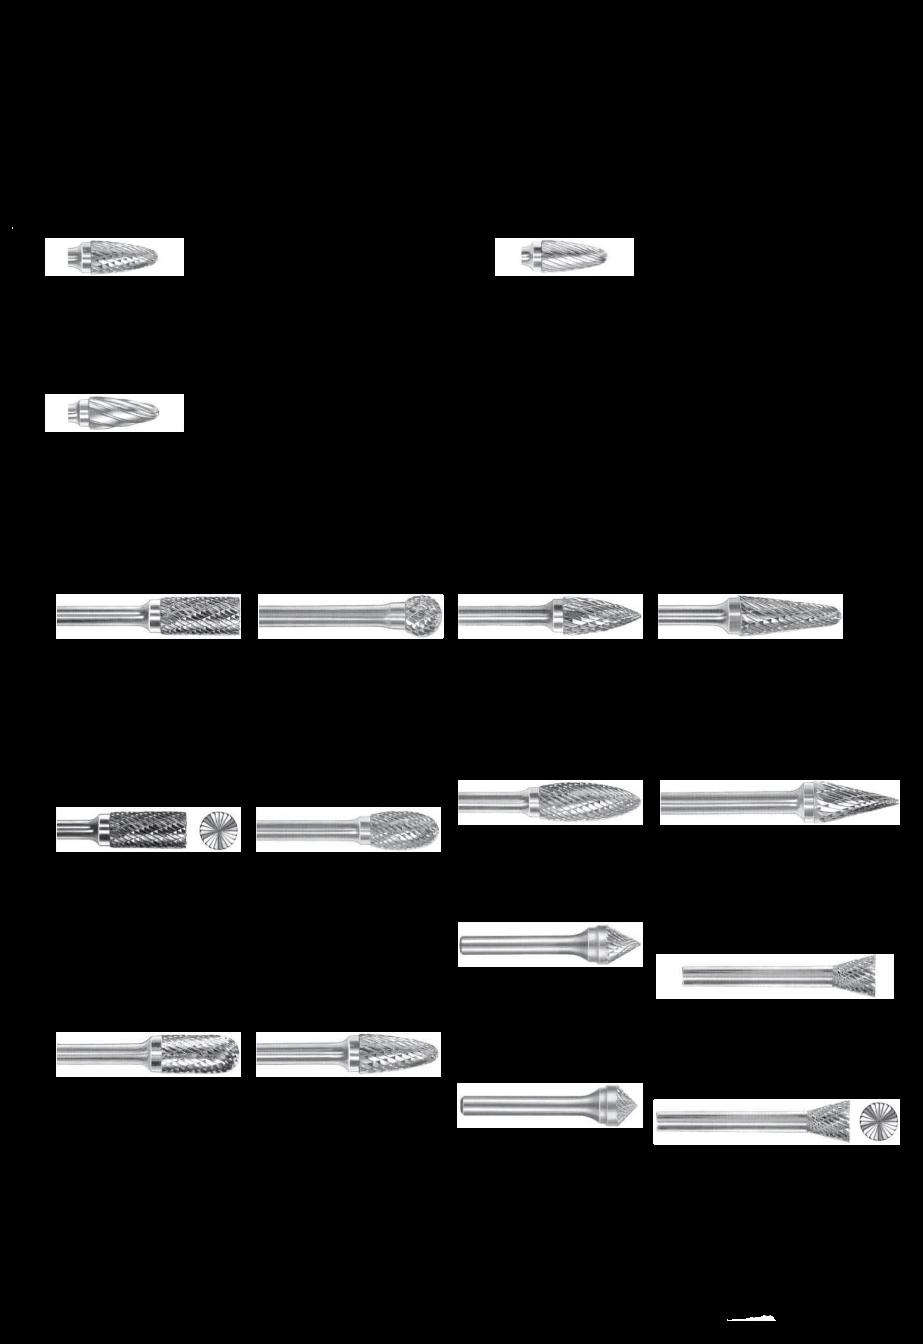 Carbide Burr By Diamohard Cross Tools Co